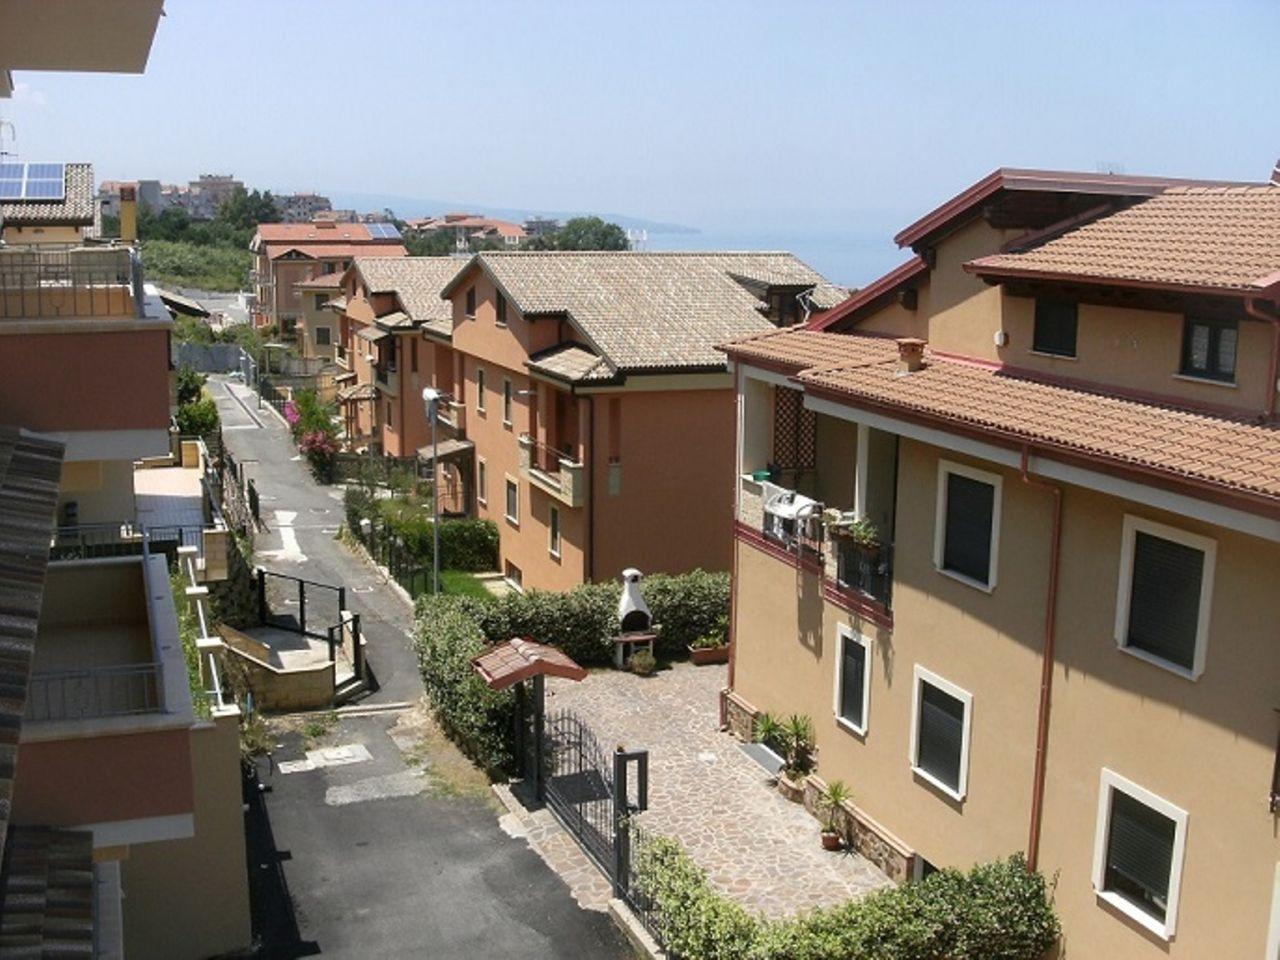 Апартаменты в Пиццо, Италия, 100 м2 - фото 1